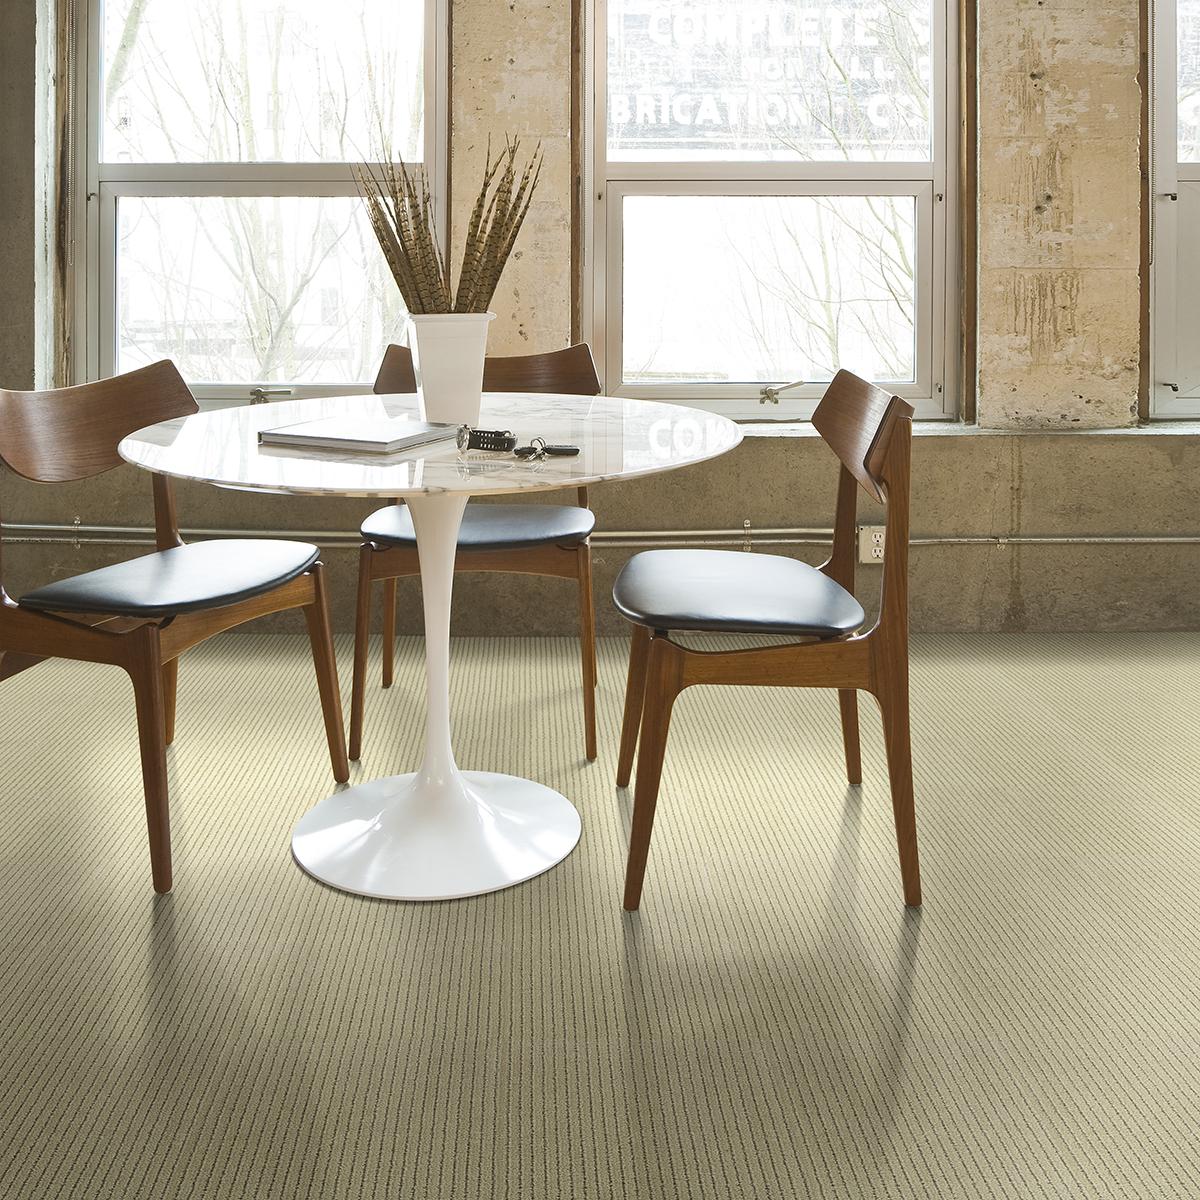 Imperial Ivory J Mish Mills Wool Carpet Rugs